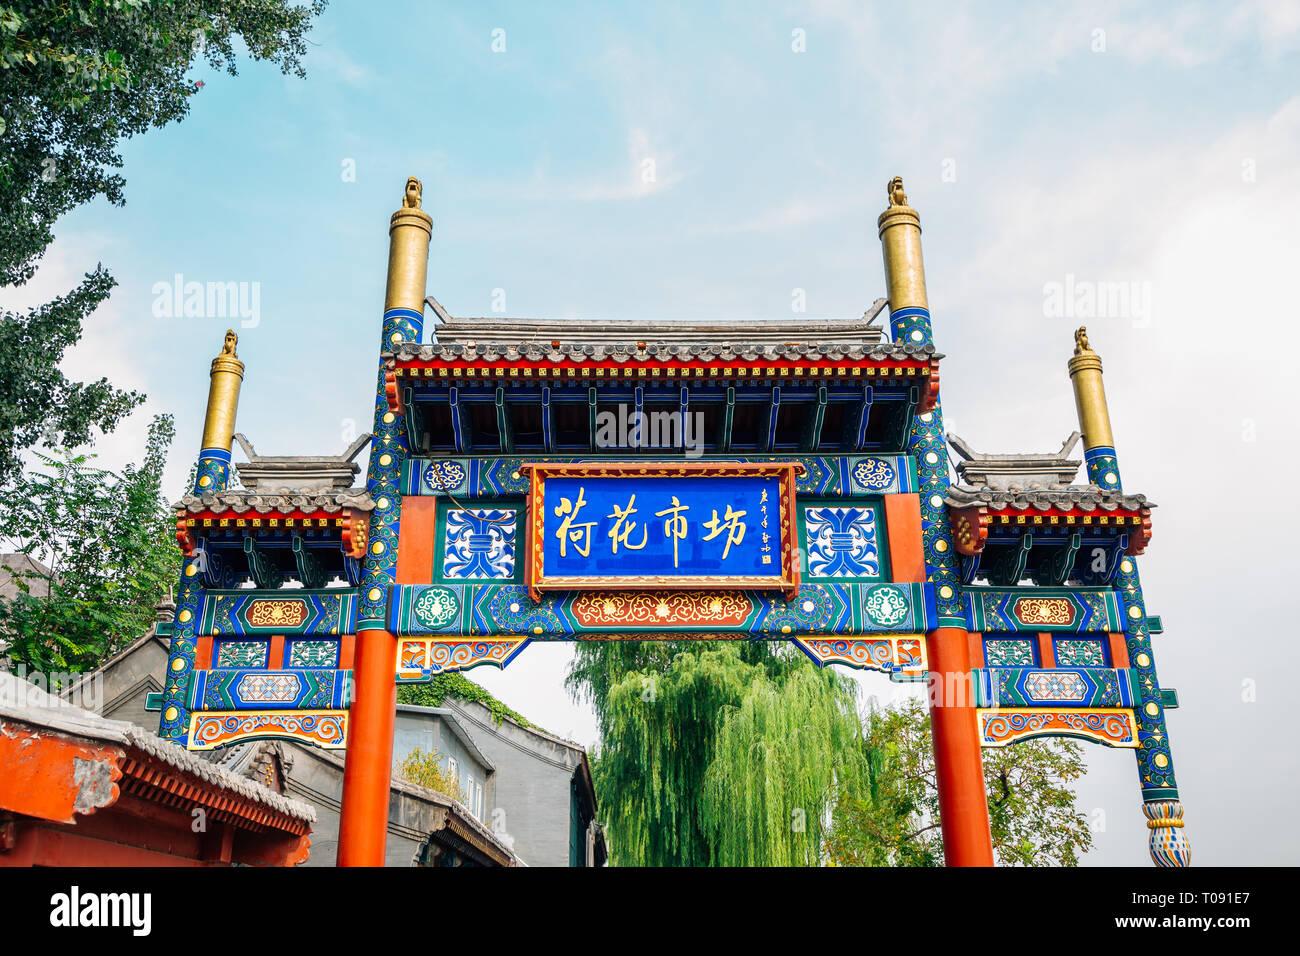 Beijing, China - September 20, 2018 : Lotus Market Marina at Shichahai - Stock Image